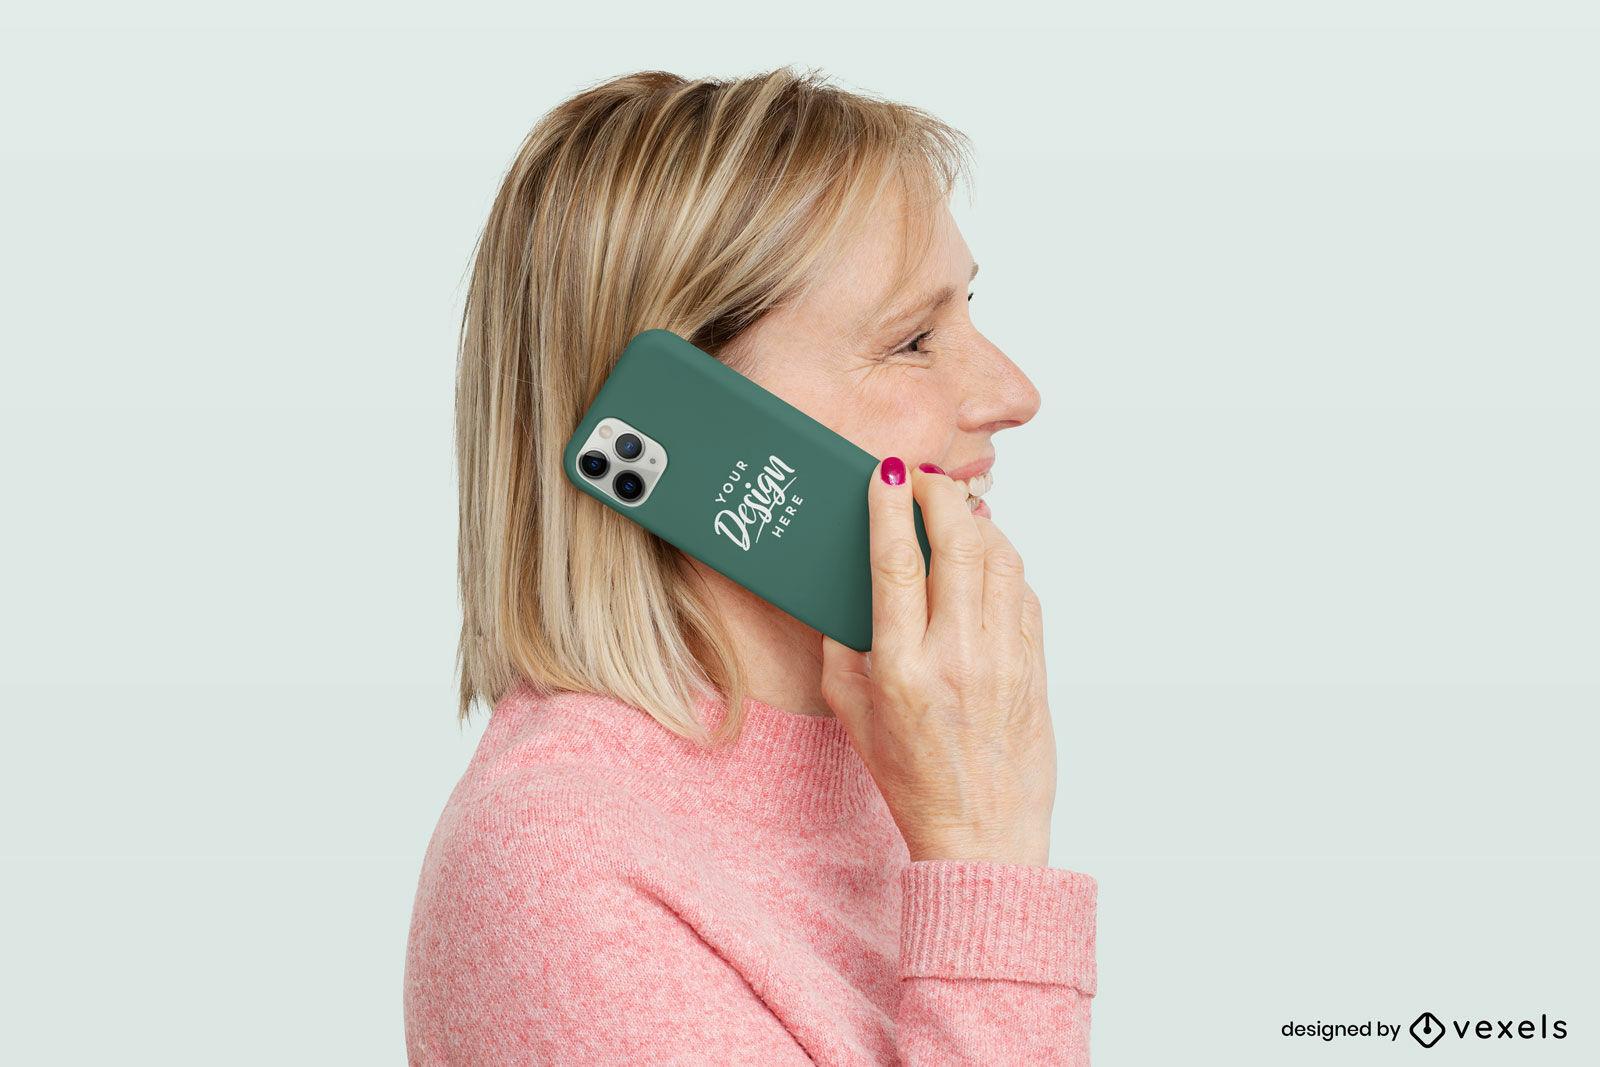 Frau und grünes Handyhüllenmodell